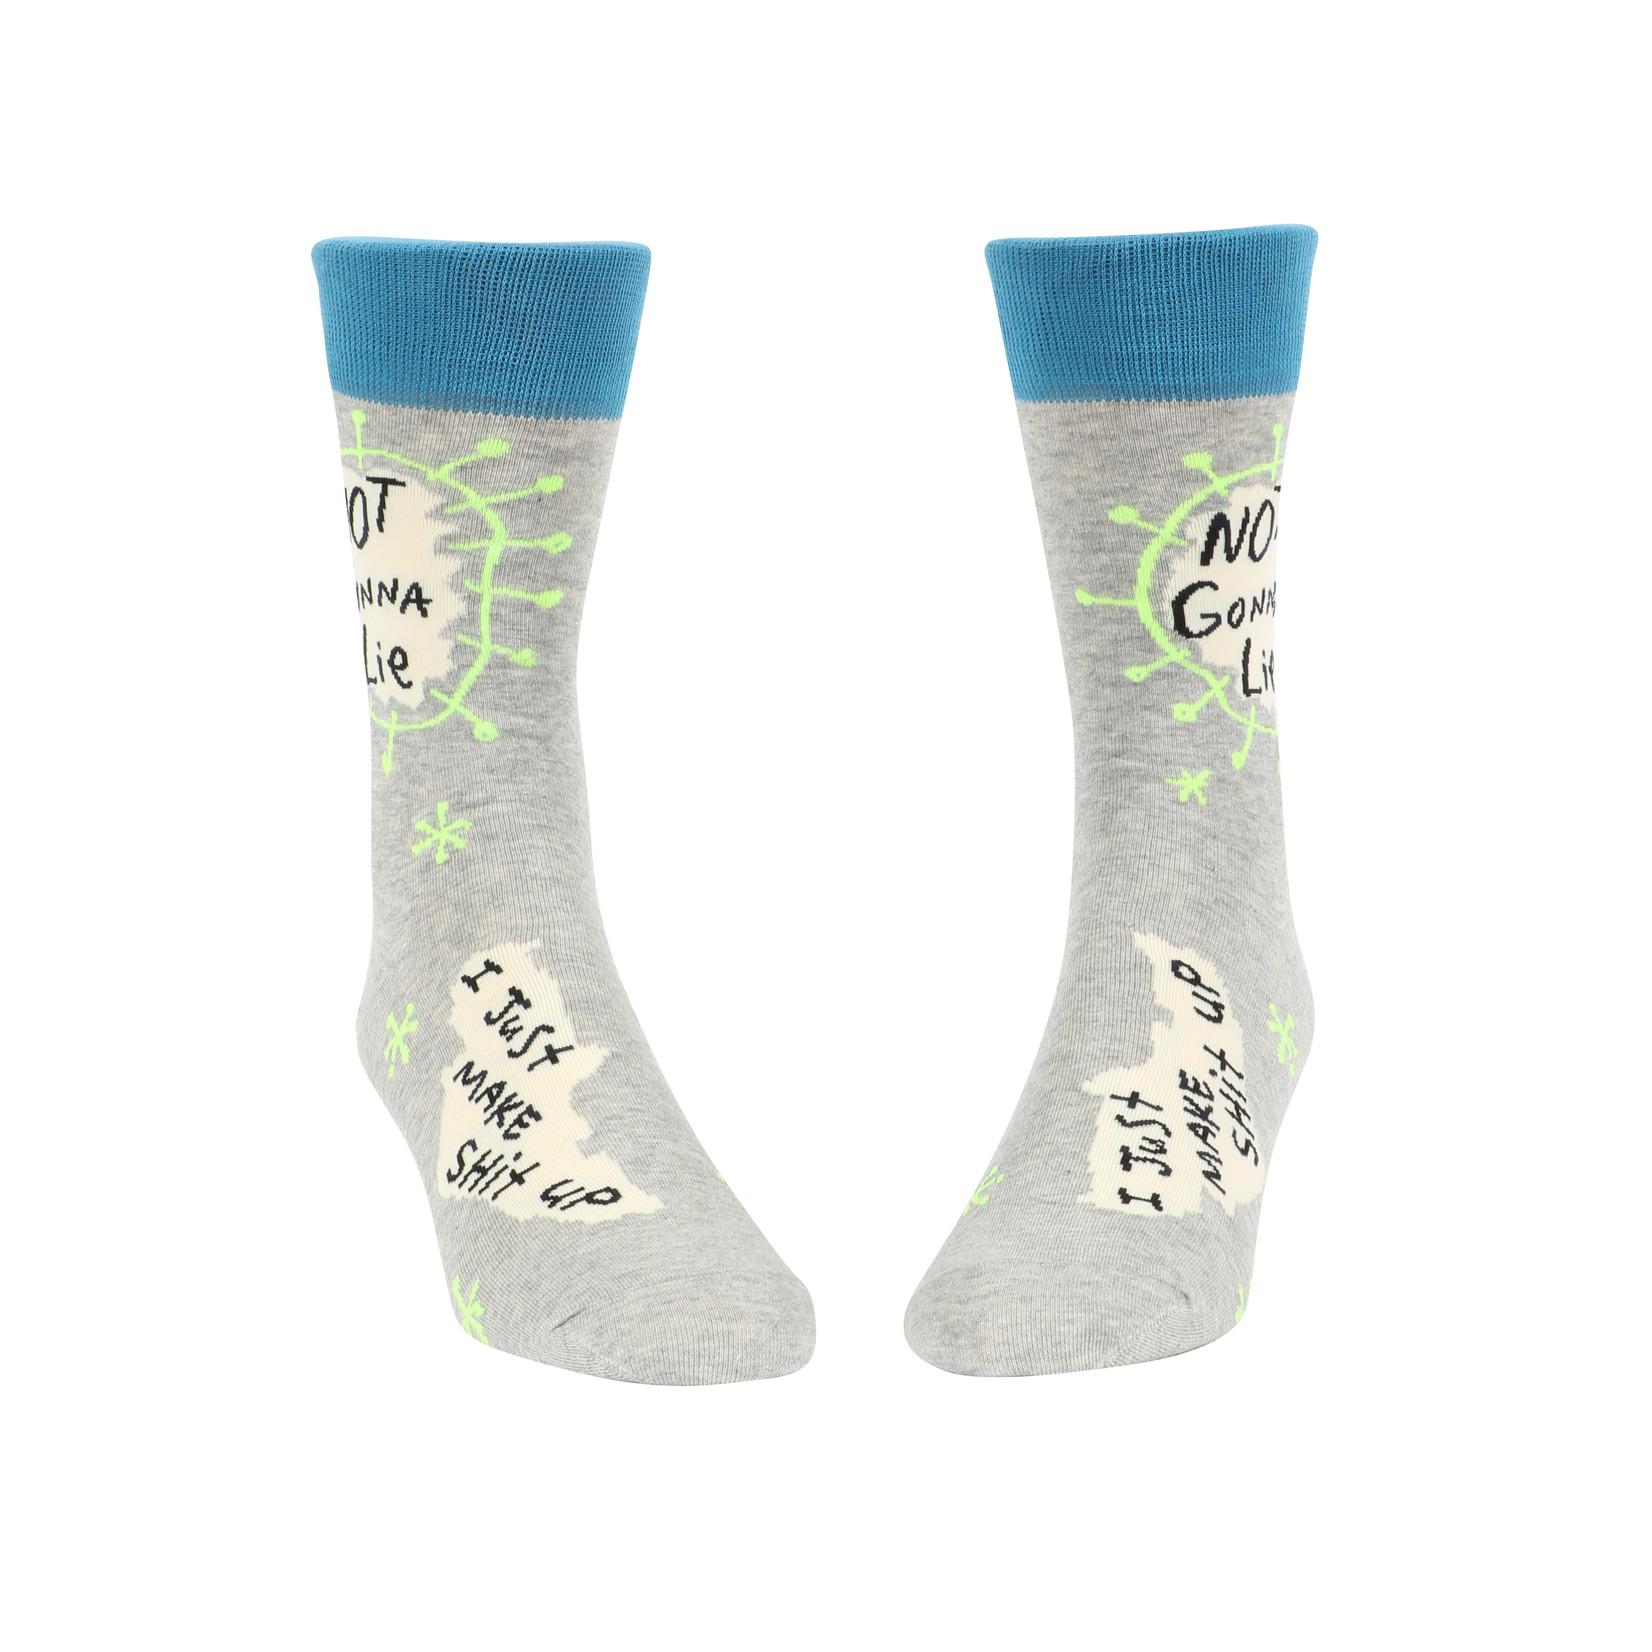 Blue Q Not Gonna Lie M - Crew Socks